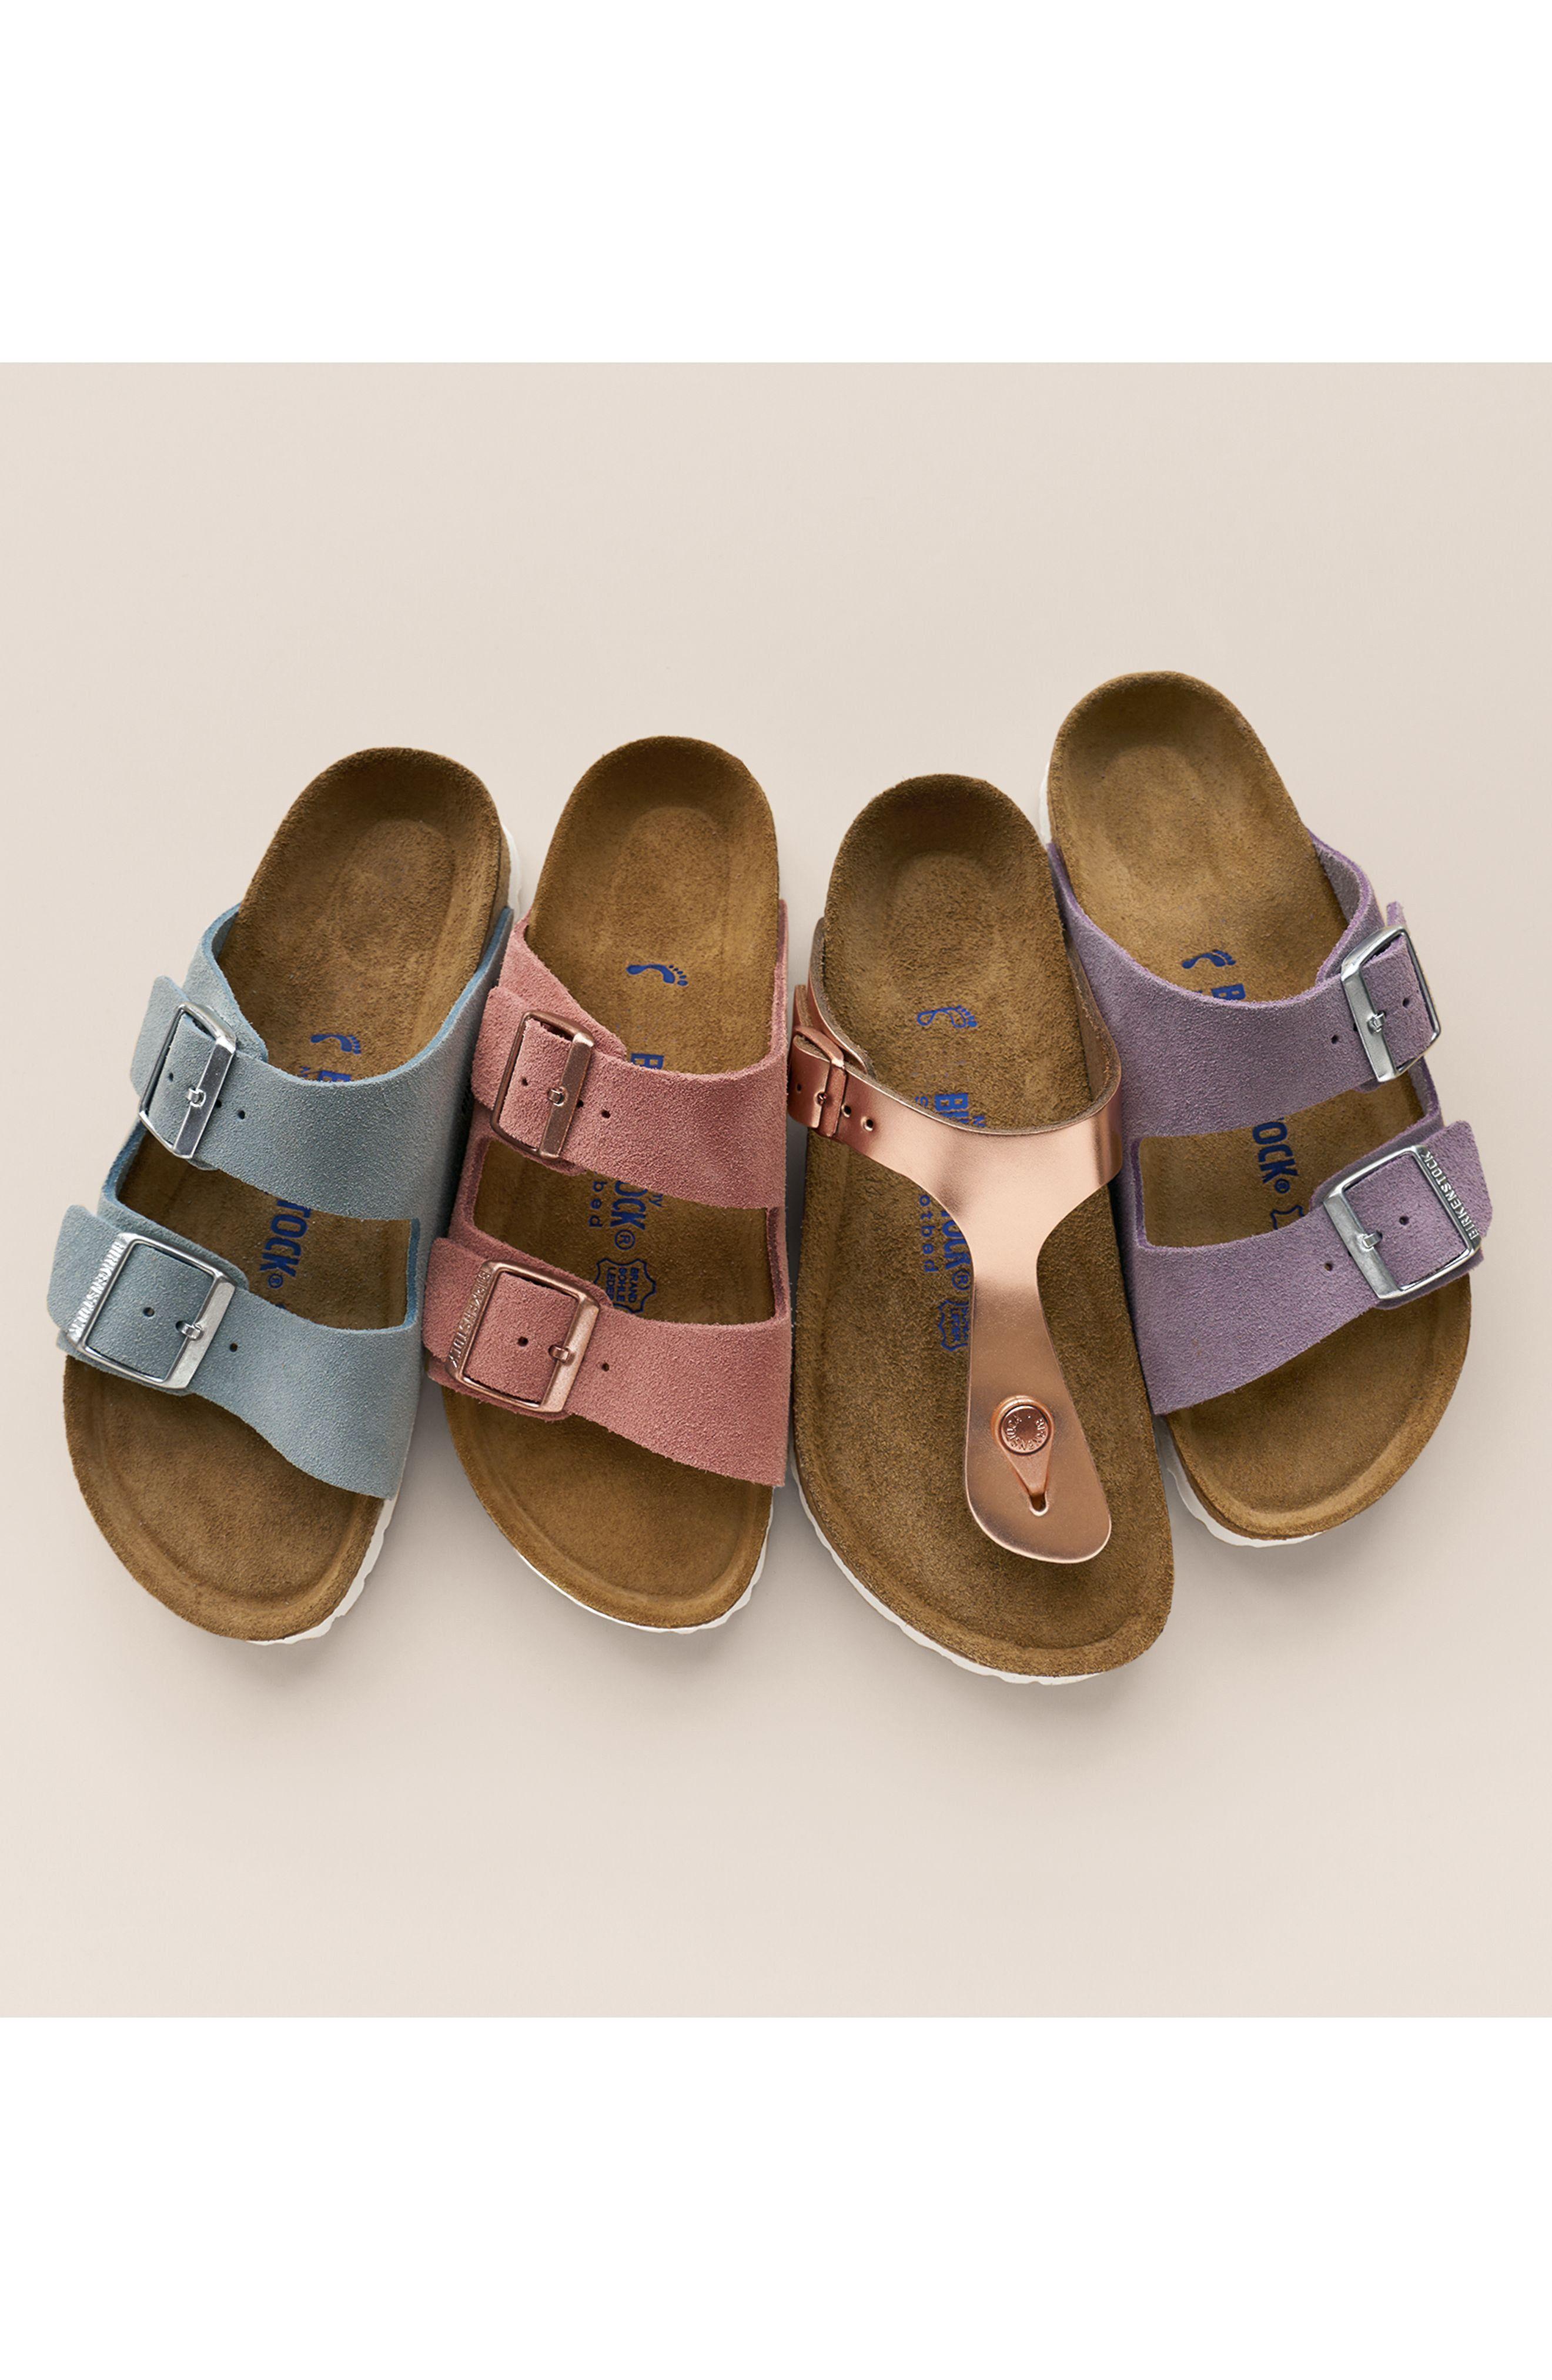 9afee7caa5 birkenstock season | style. | Shoes, Birkenstock, Orthopedic shoes